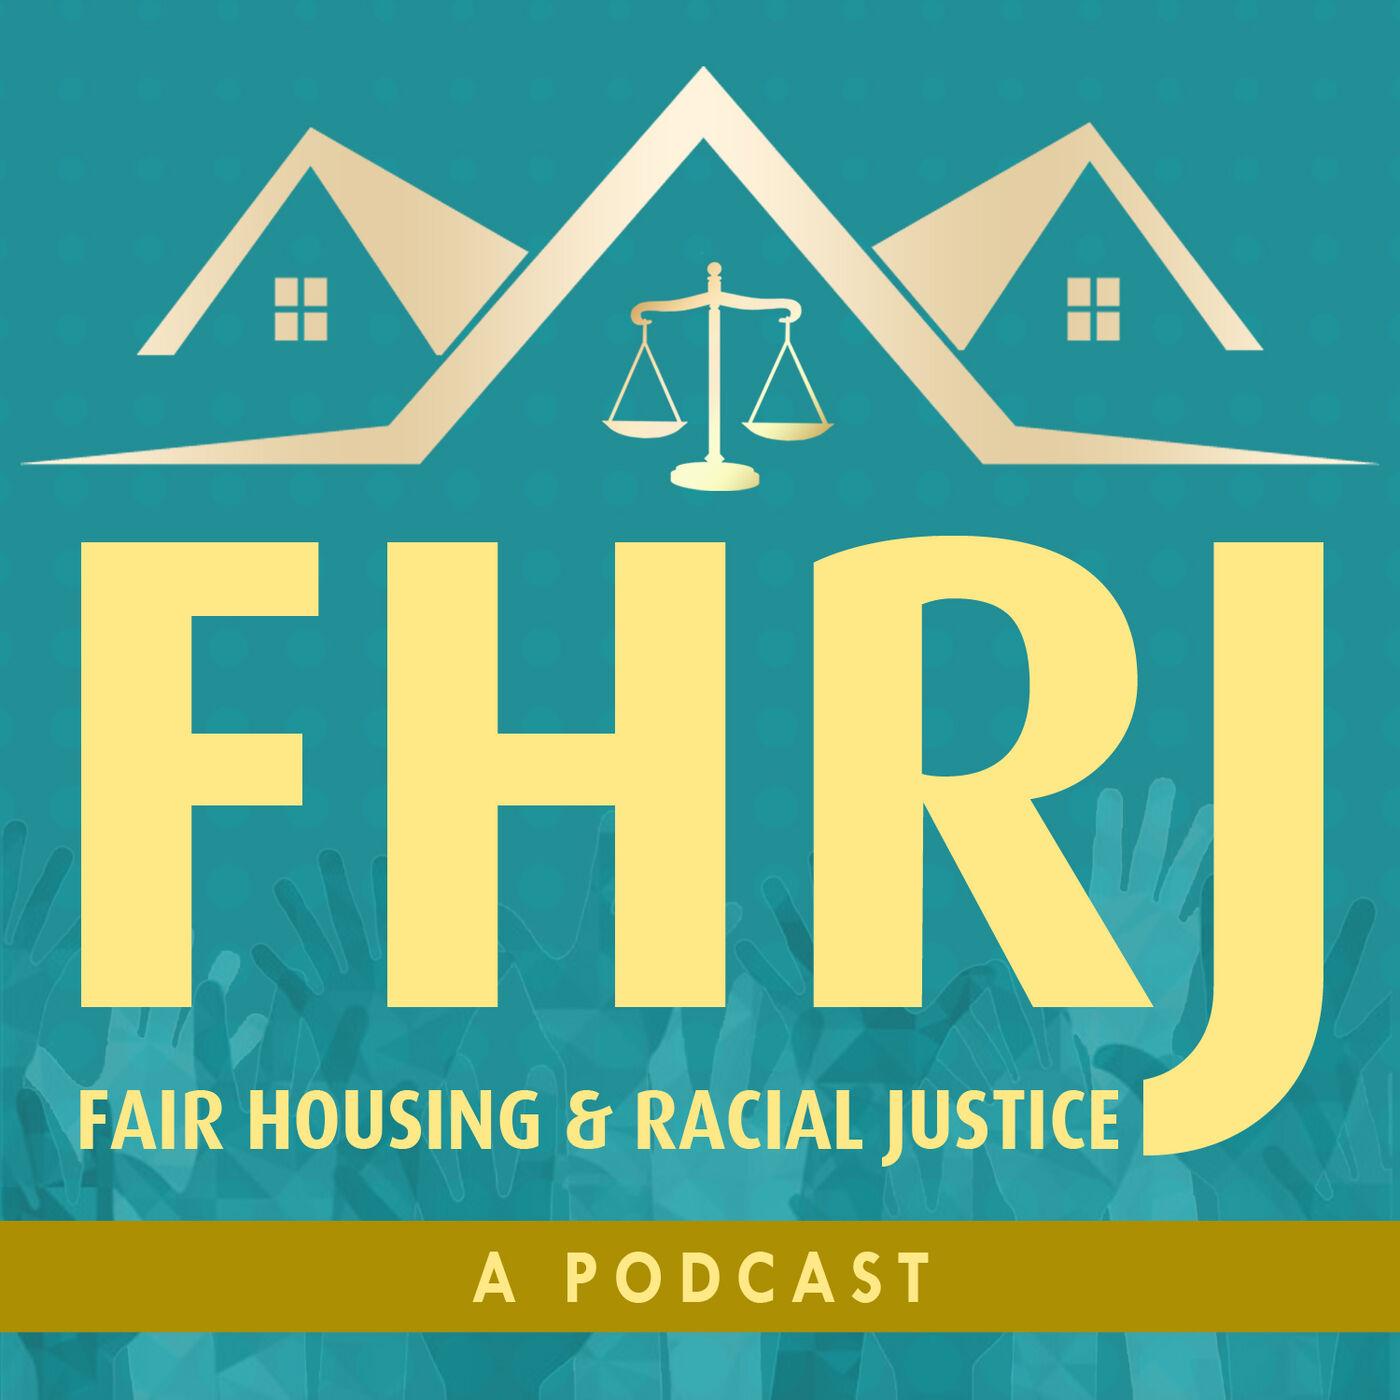 FHRJ 7: A Live Discussion on Housing & the LGBTQIA Community